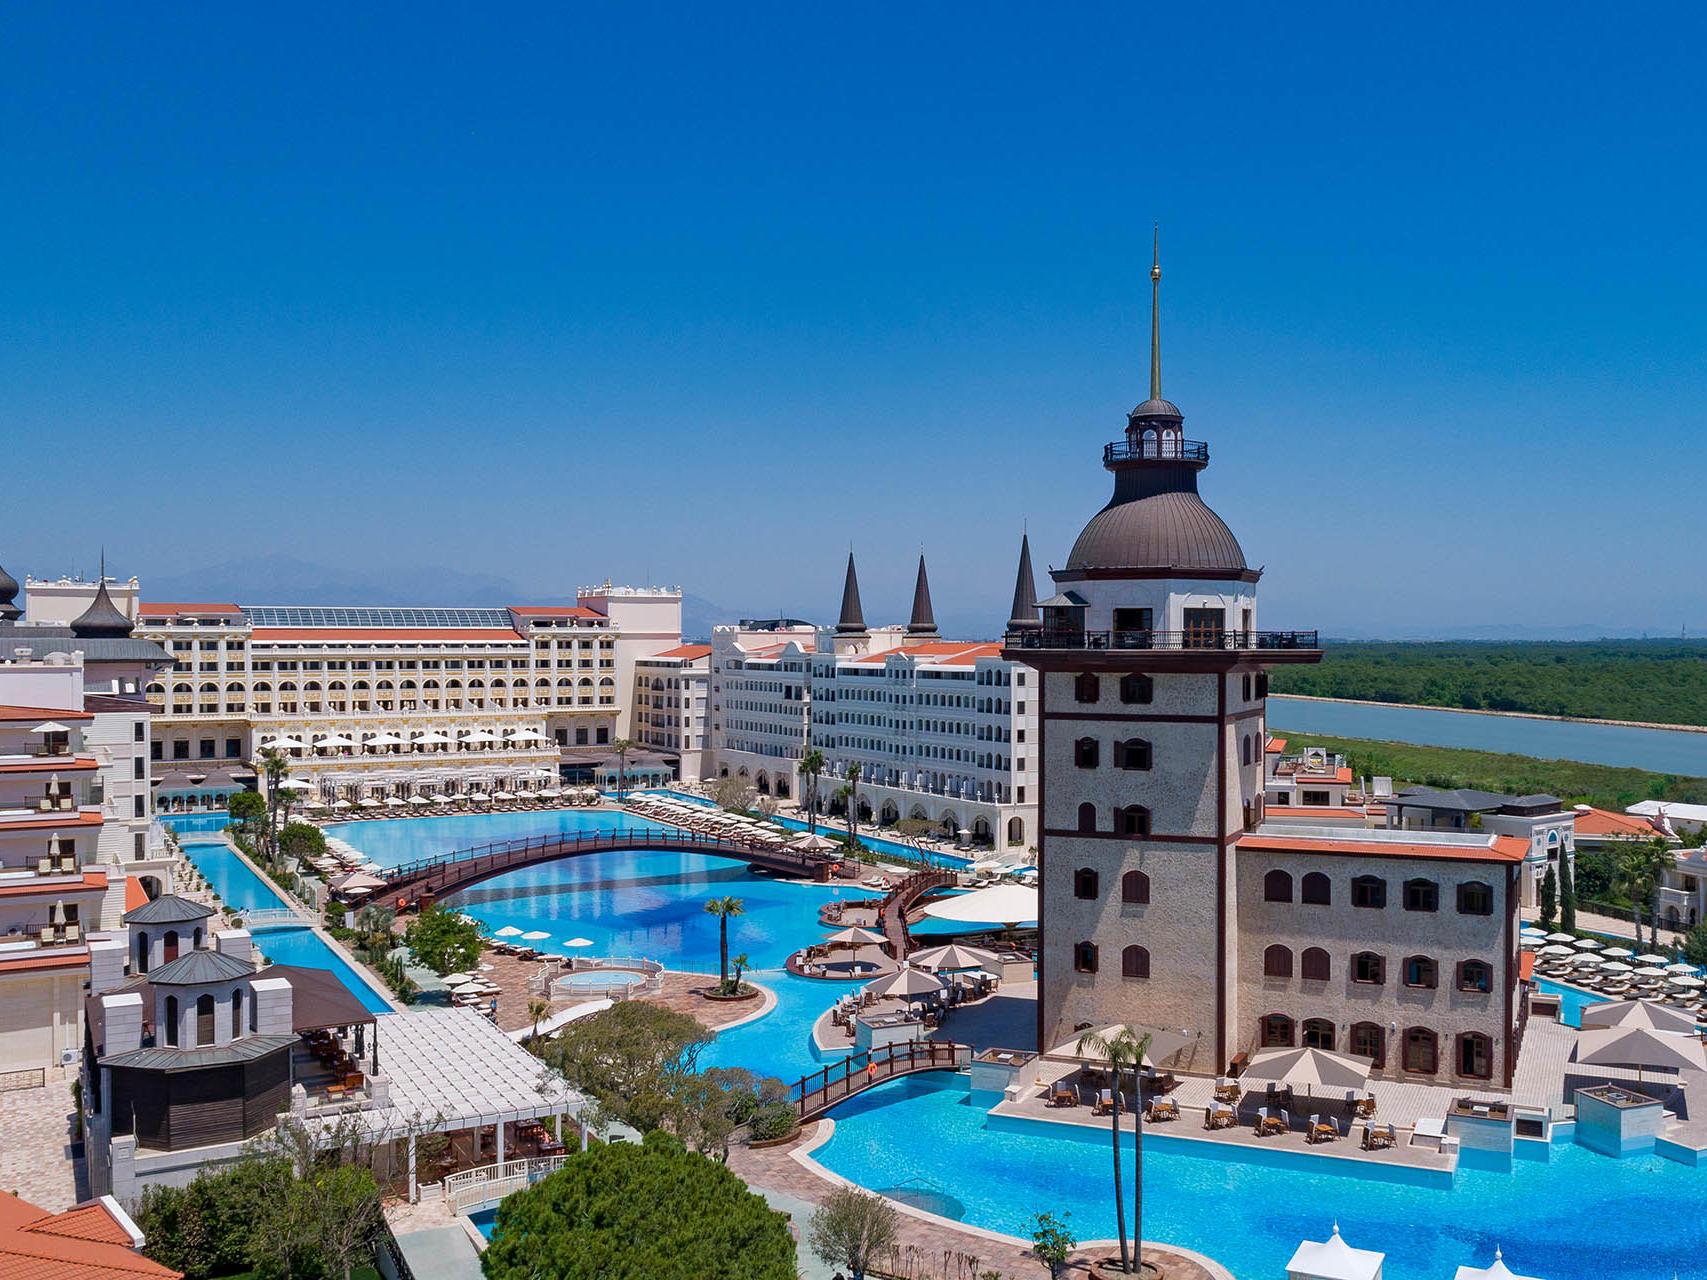 Mardanpalacehotel-Otel-Mermer-Dekorasyon- (1)